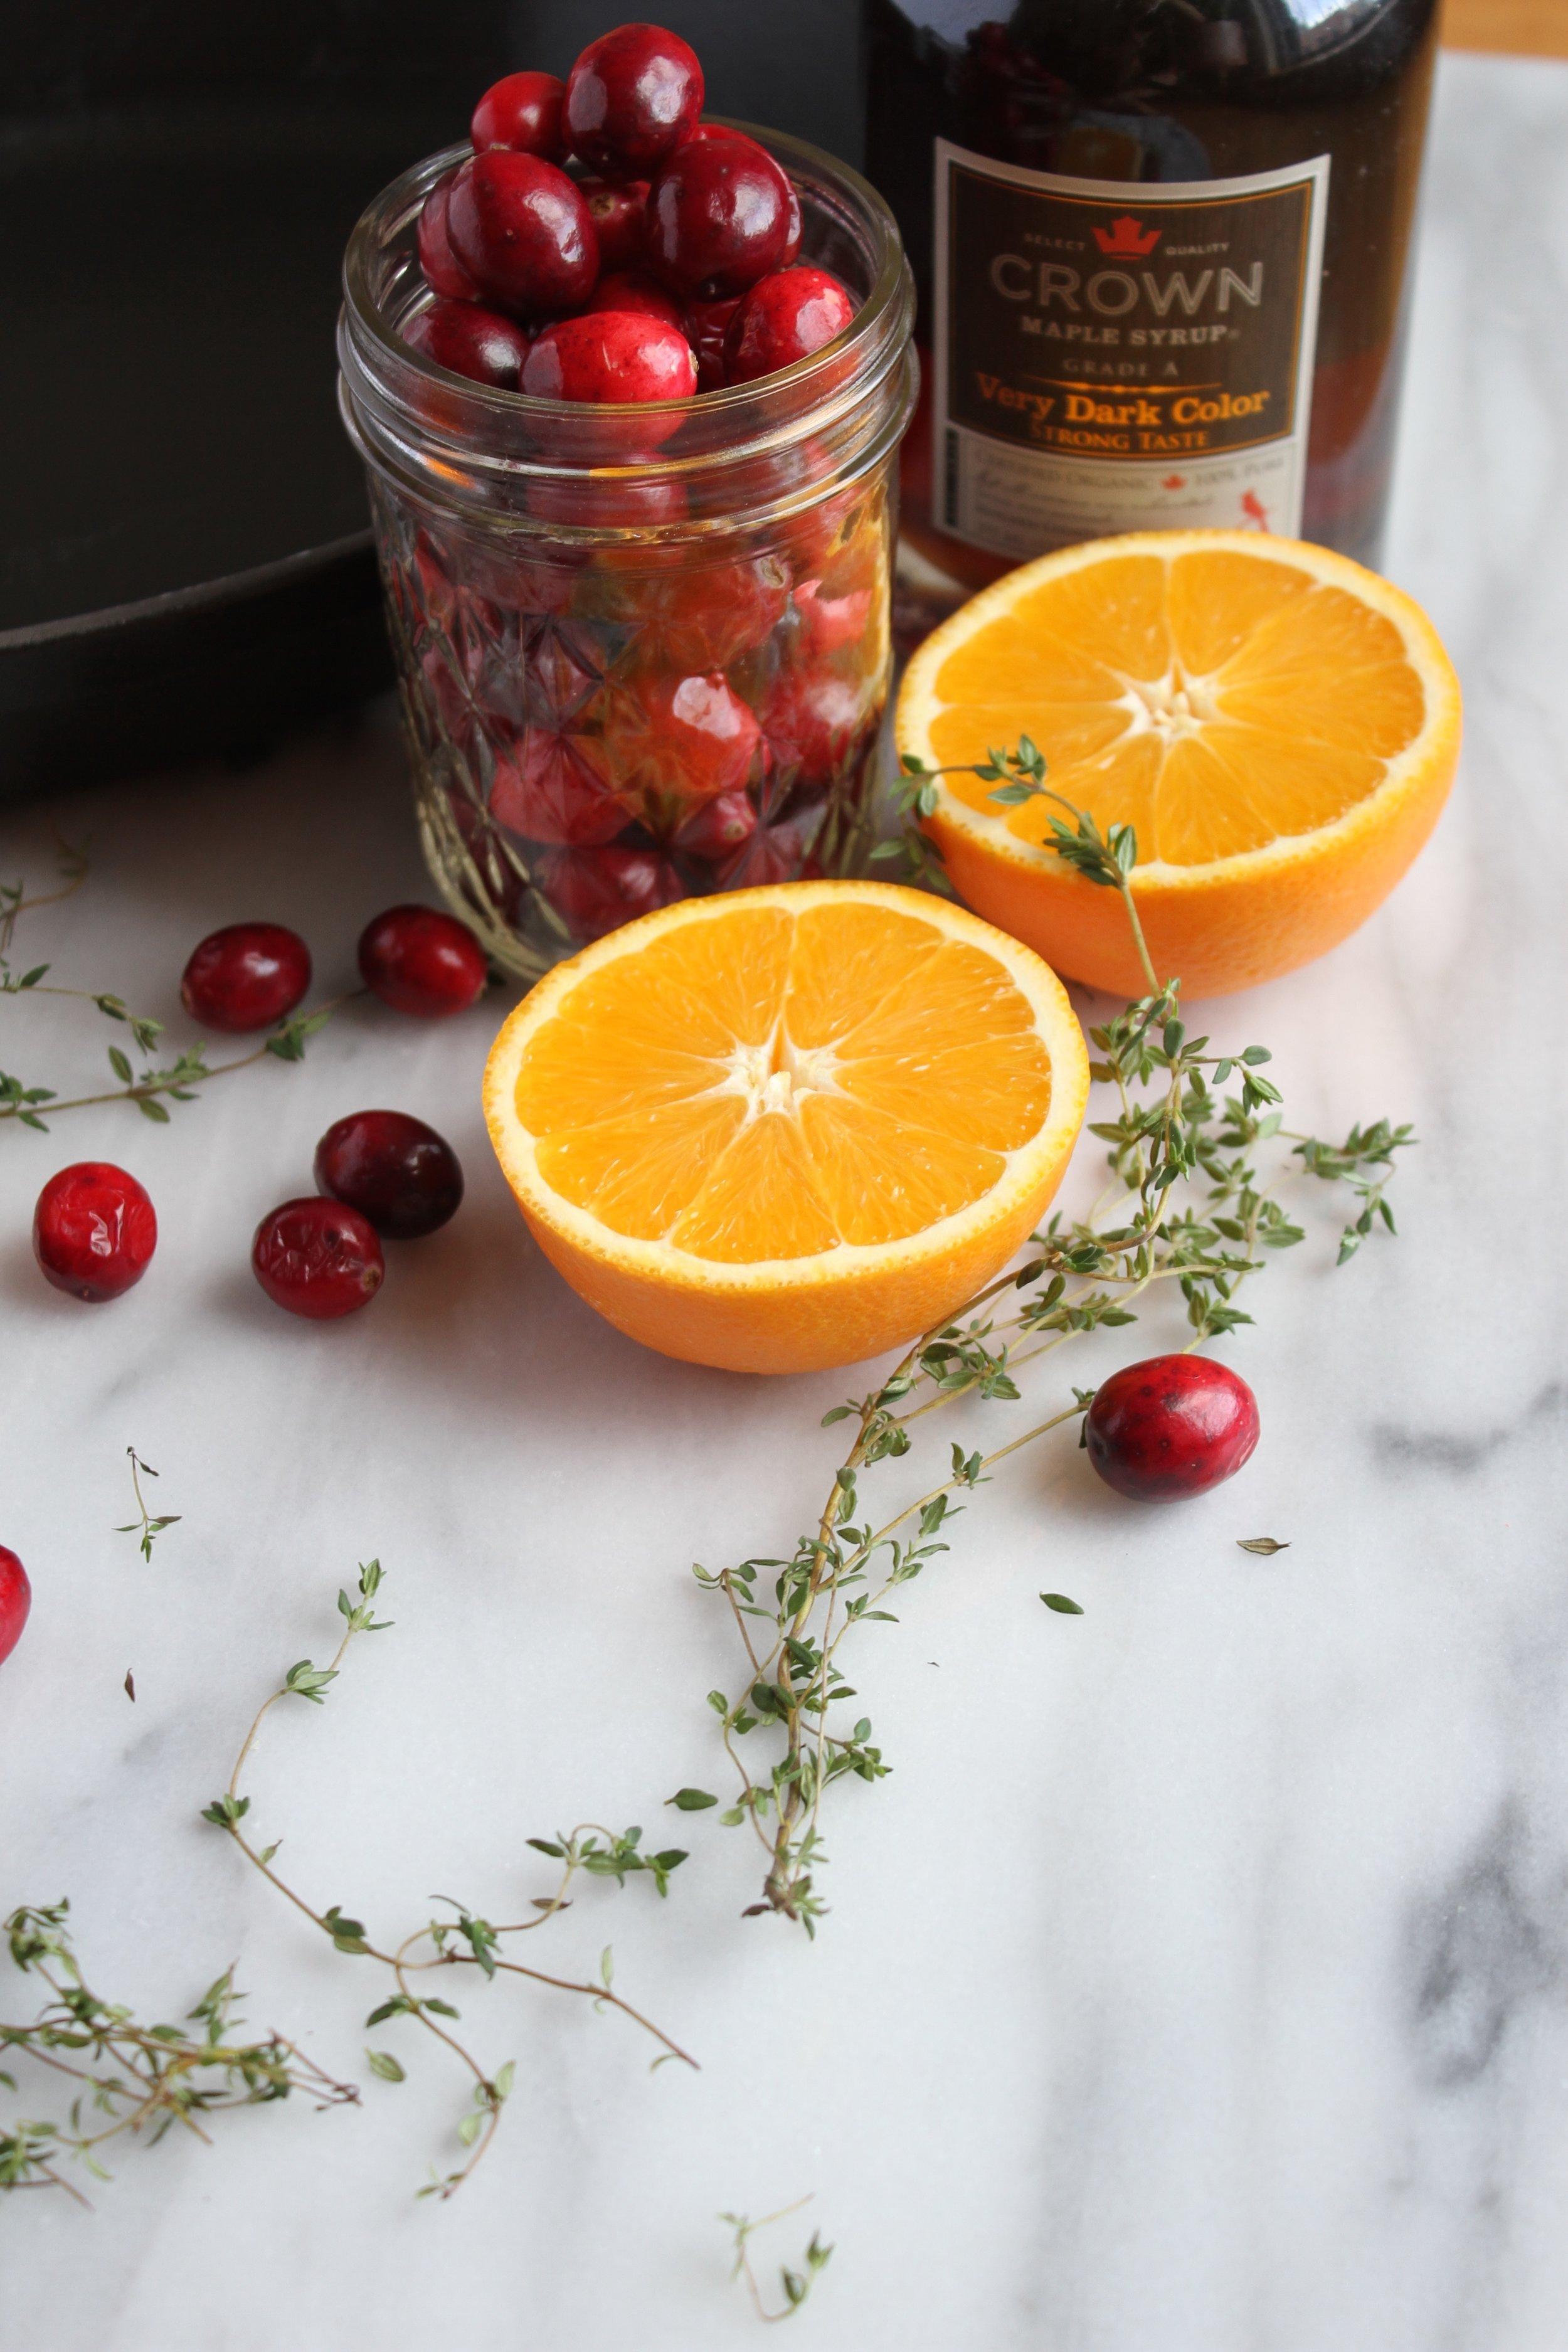 Roasted Cranberry Orange Maple Chicken w:Vitamix x Living Minnaly _12.jpg